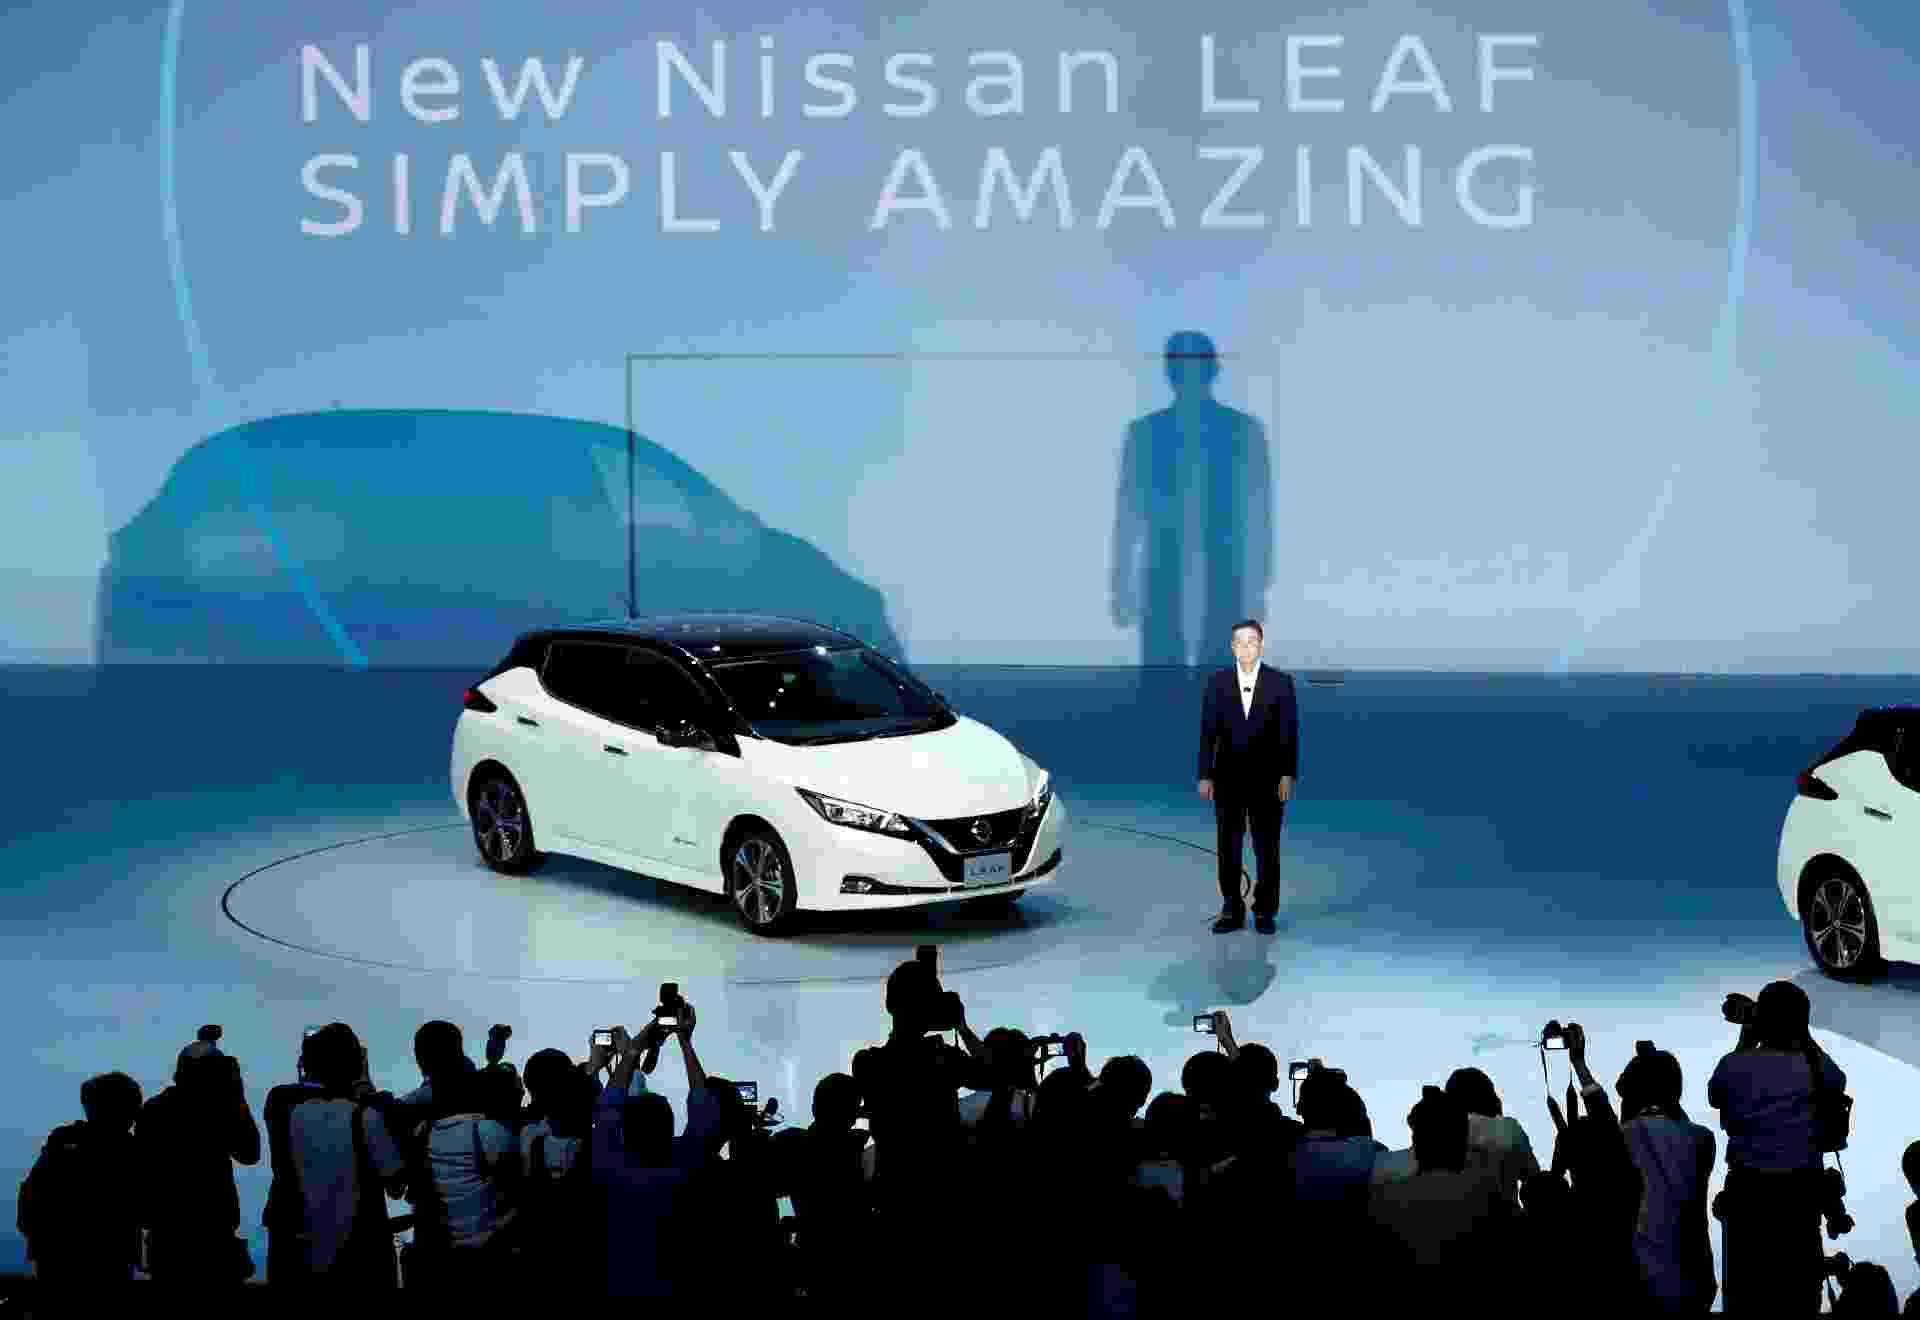 Nissan Leaf 2018 - Kim Kyung-Hoon/Reuters